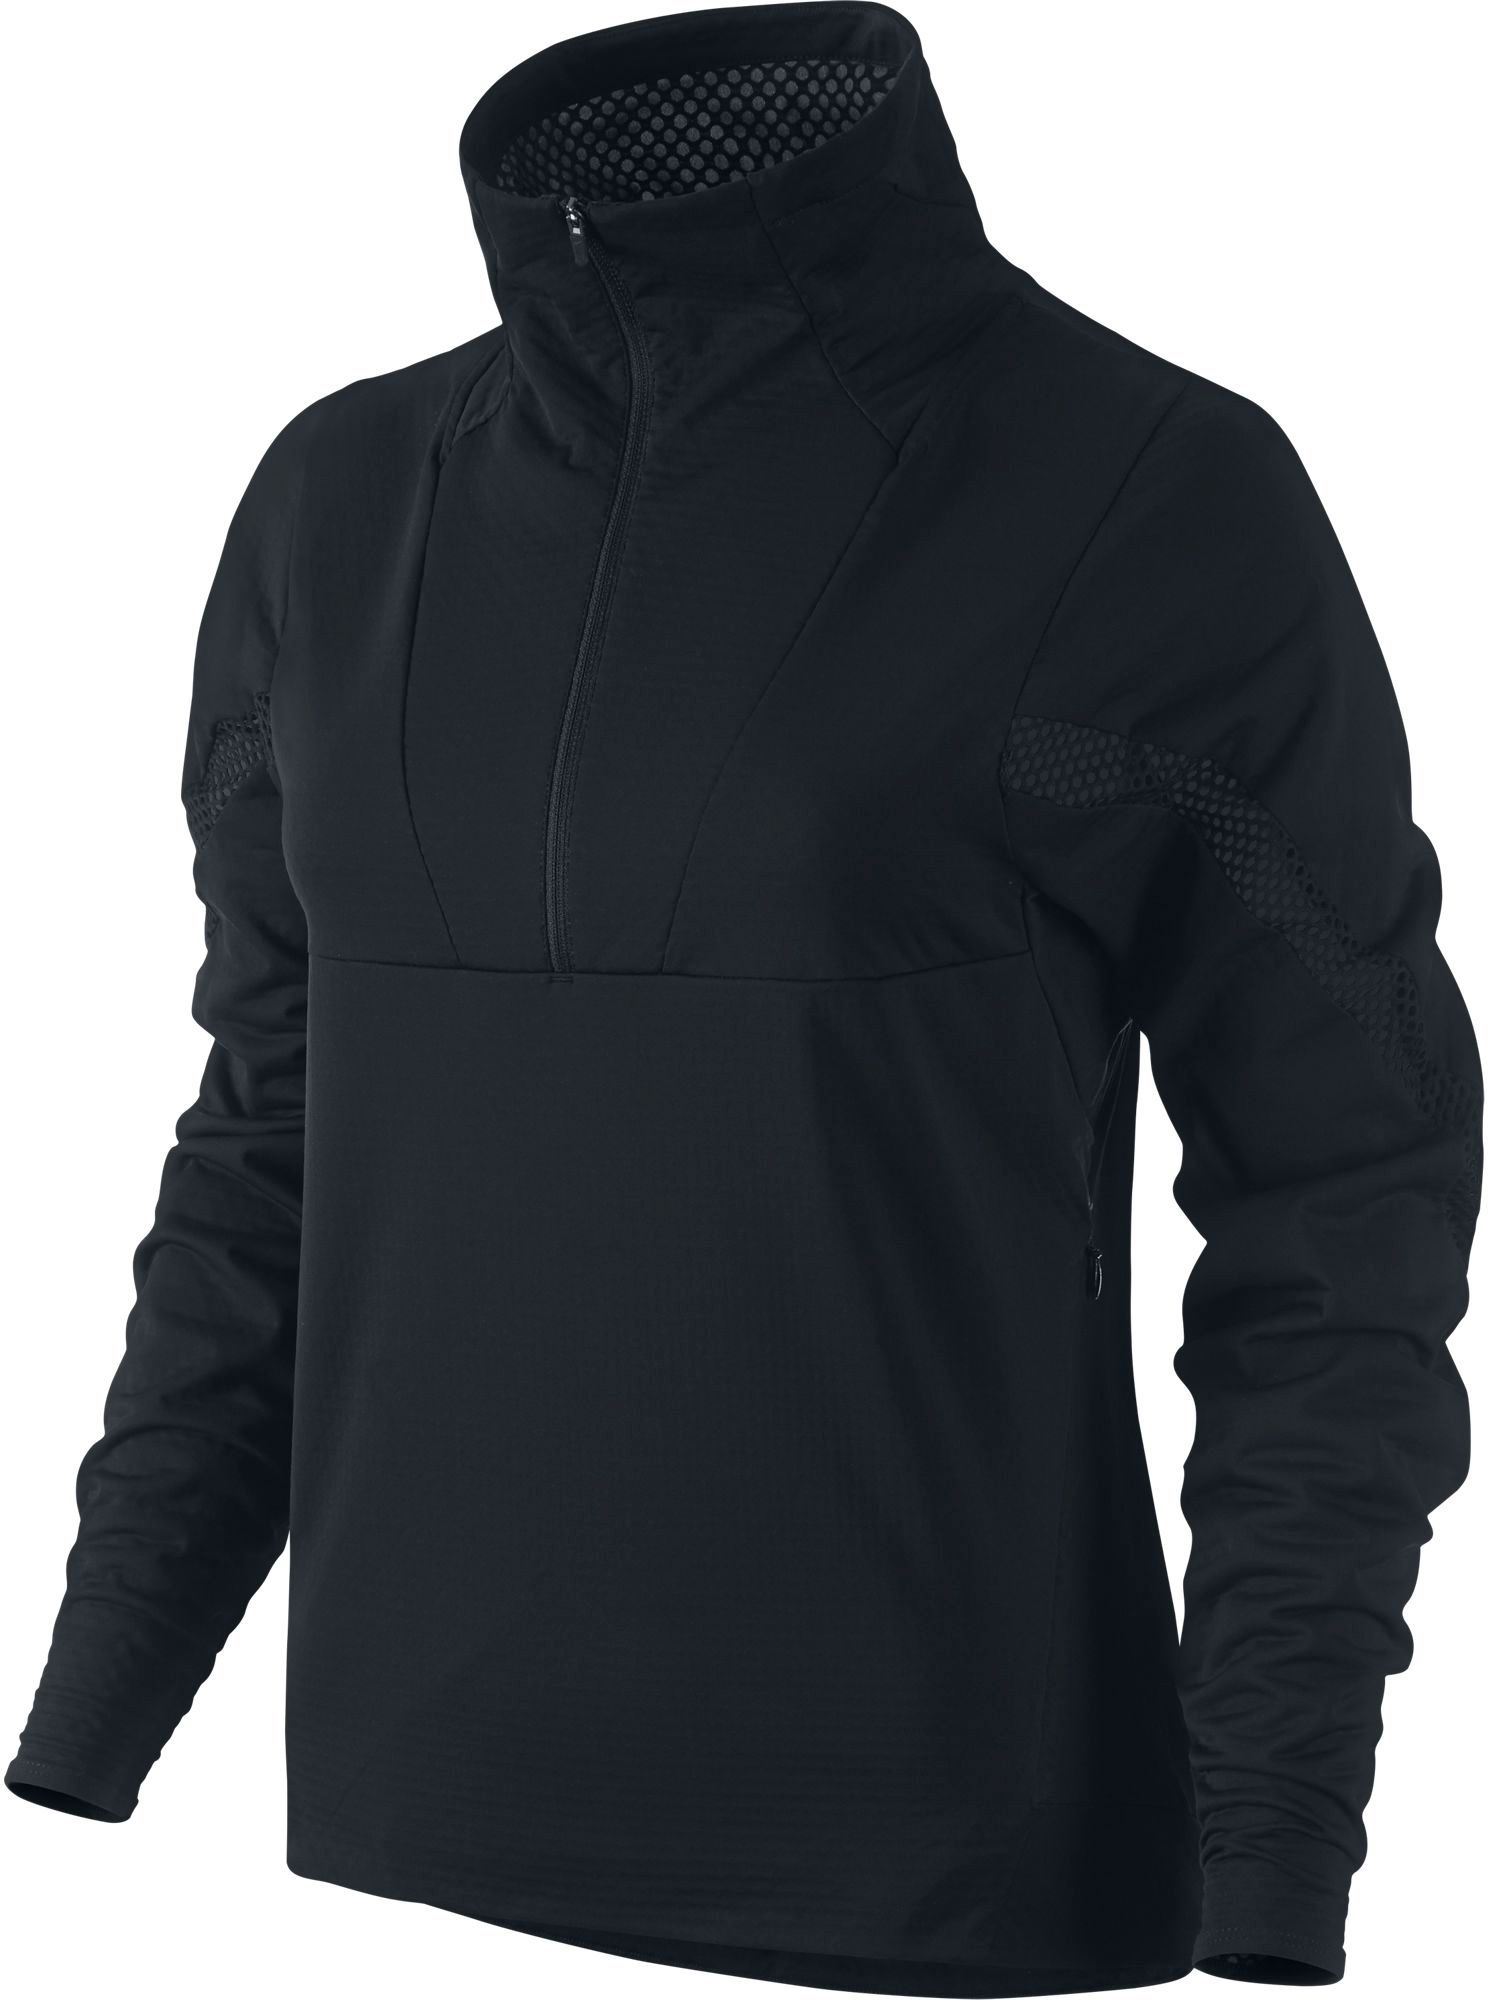 nike rain jacket womens black and white check